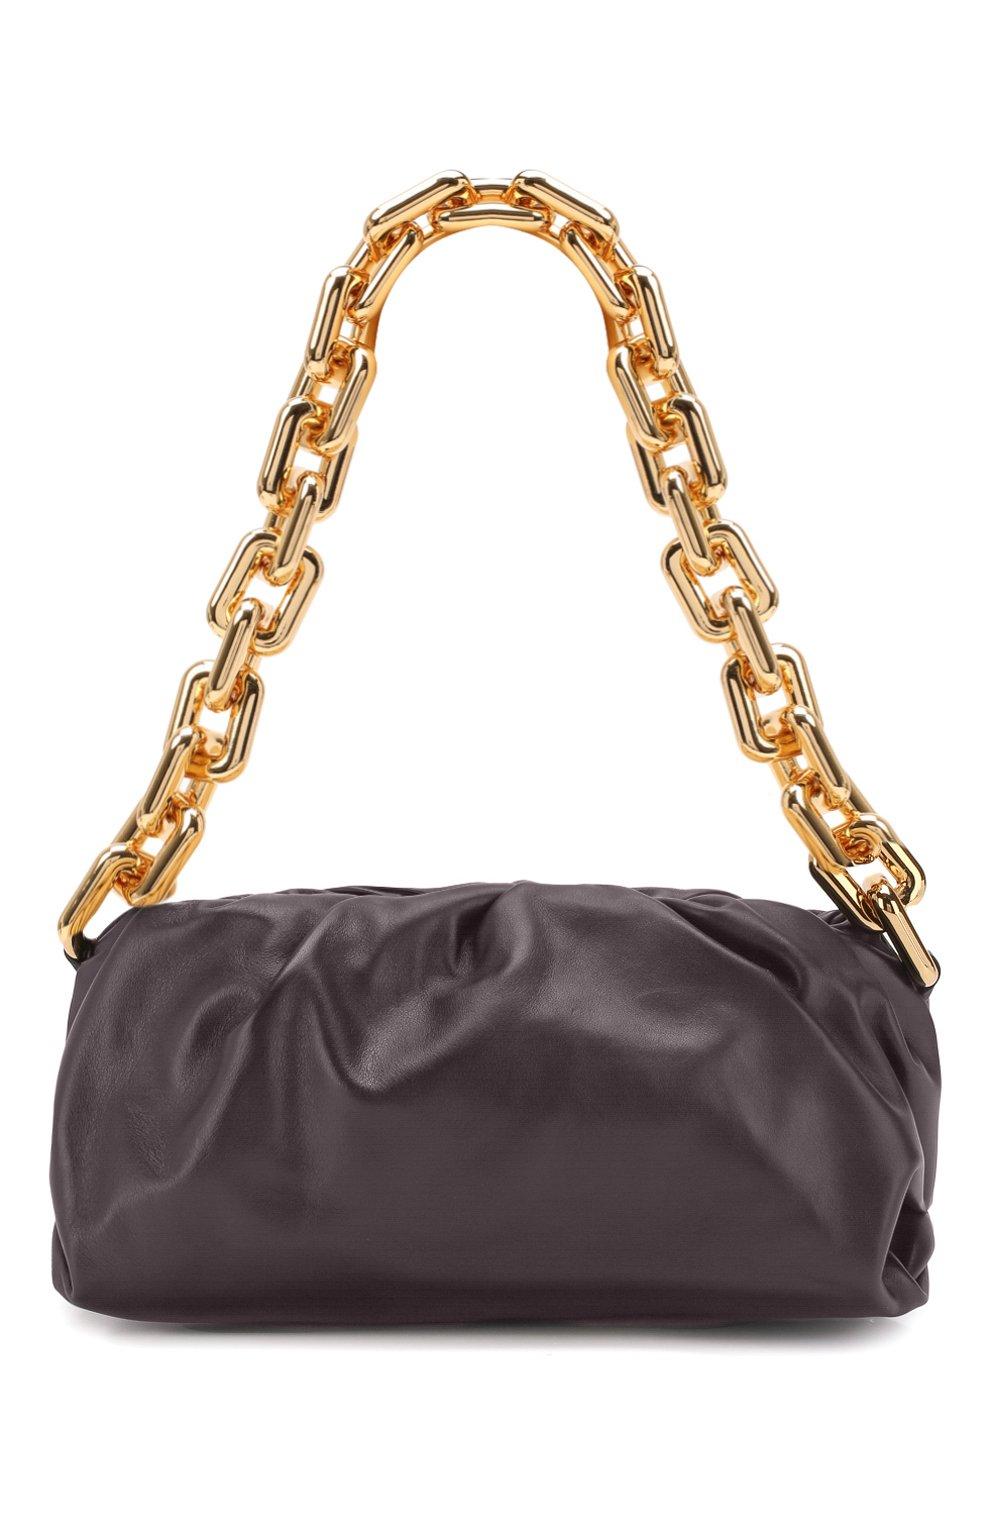 Женская сумка chain pouch BOTTEGA VENETA темно-фиолетового цвета, арт. 620230/VCP40 | Фото 1